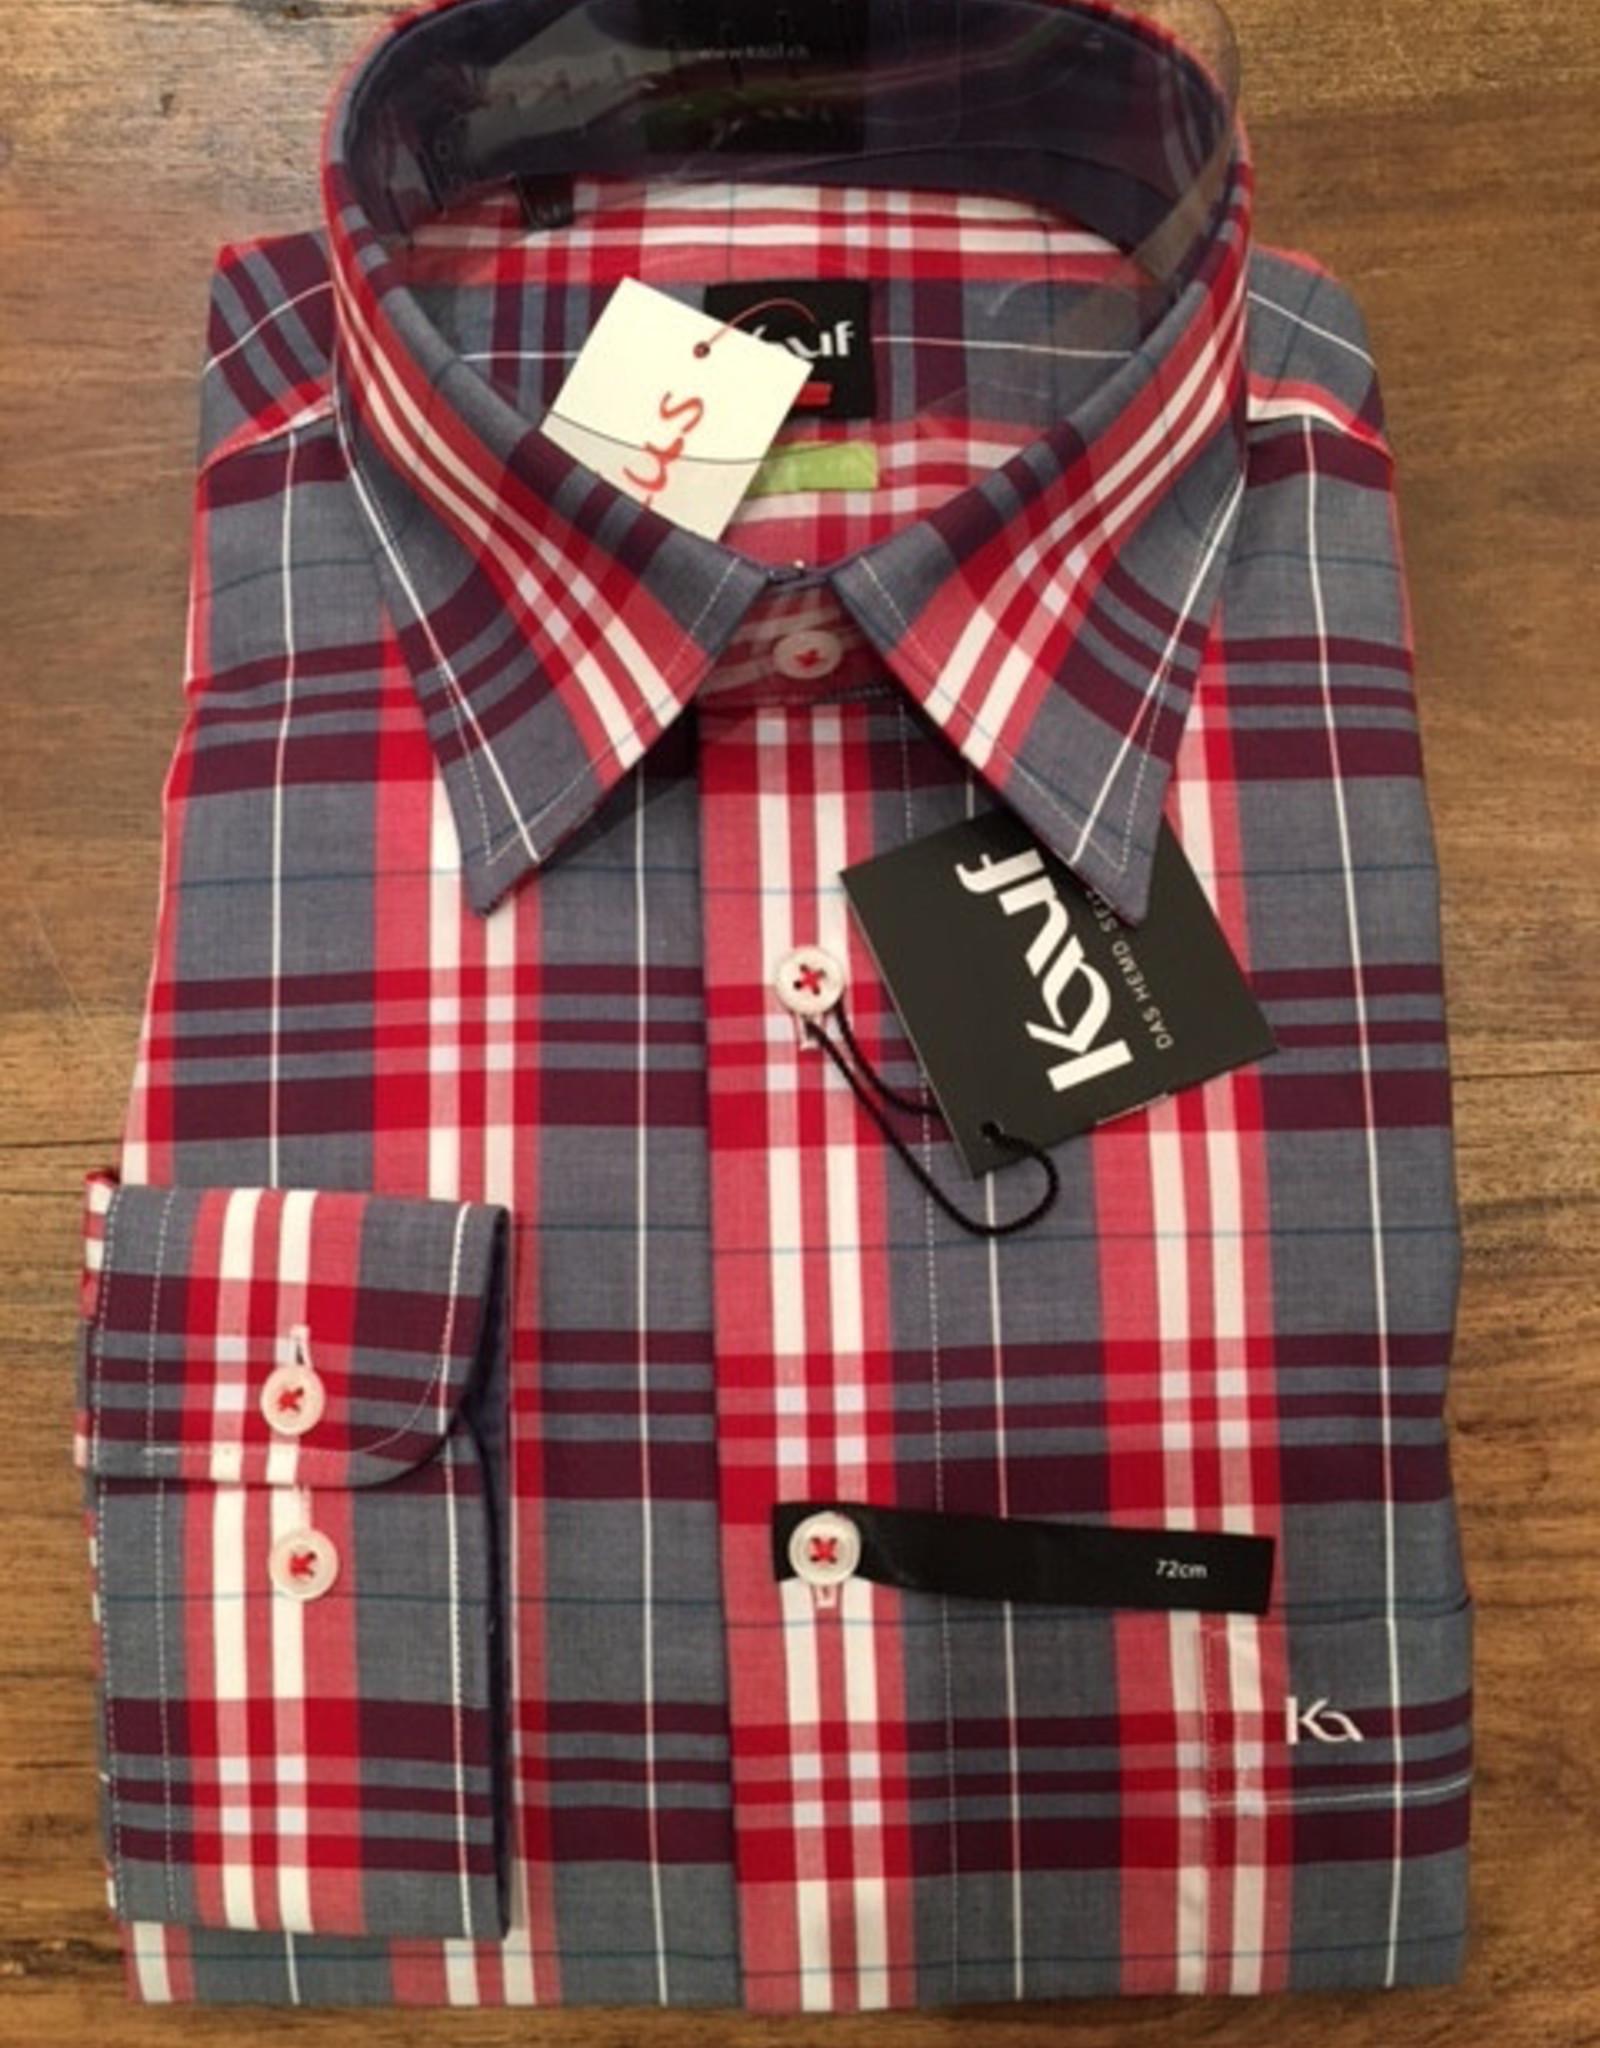 Kauf Kauf Hemd ModernFit, tailliert, grosses karo AL 72cm